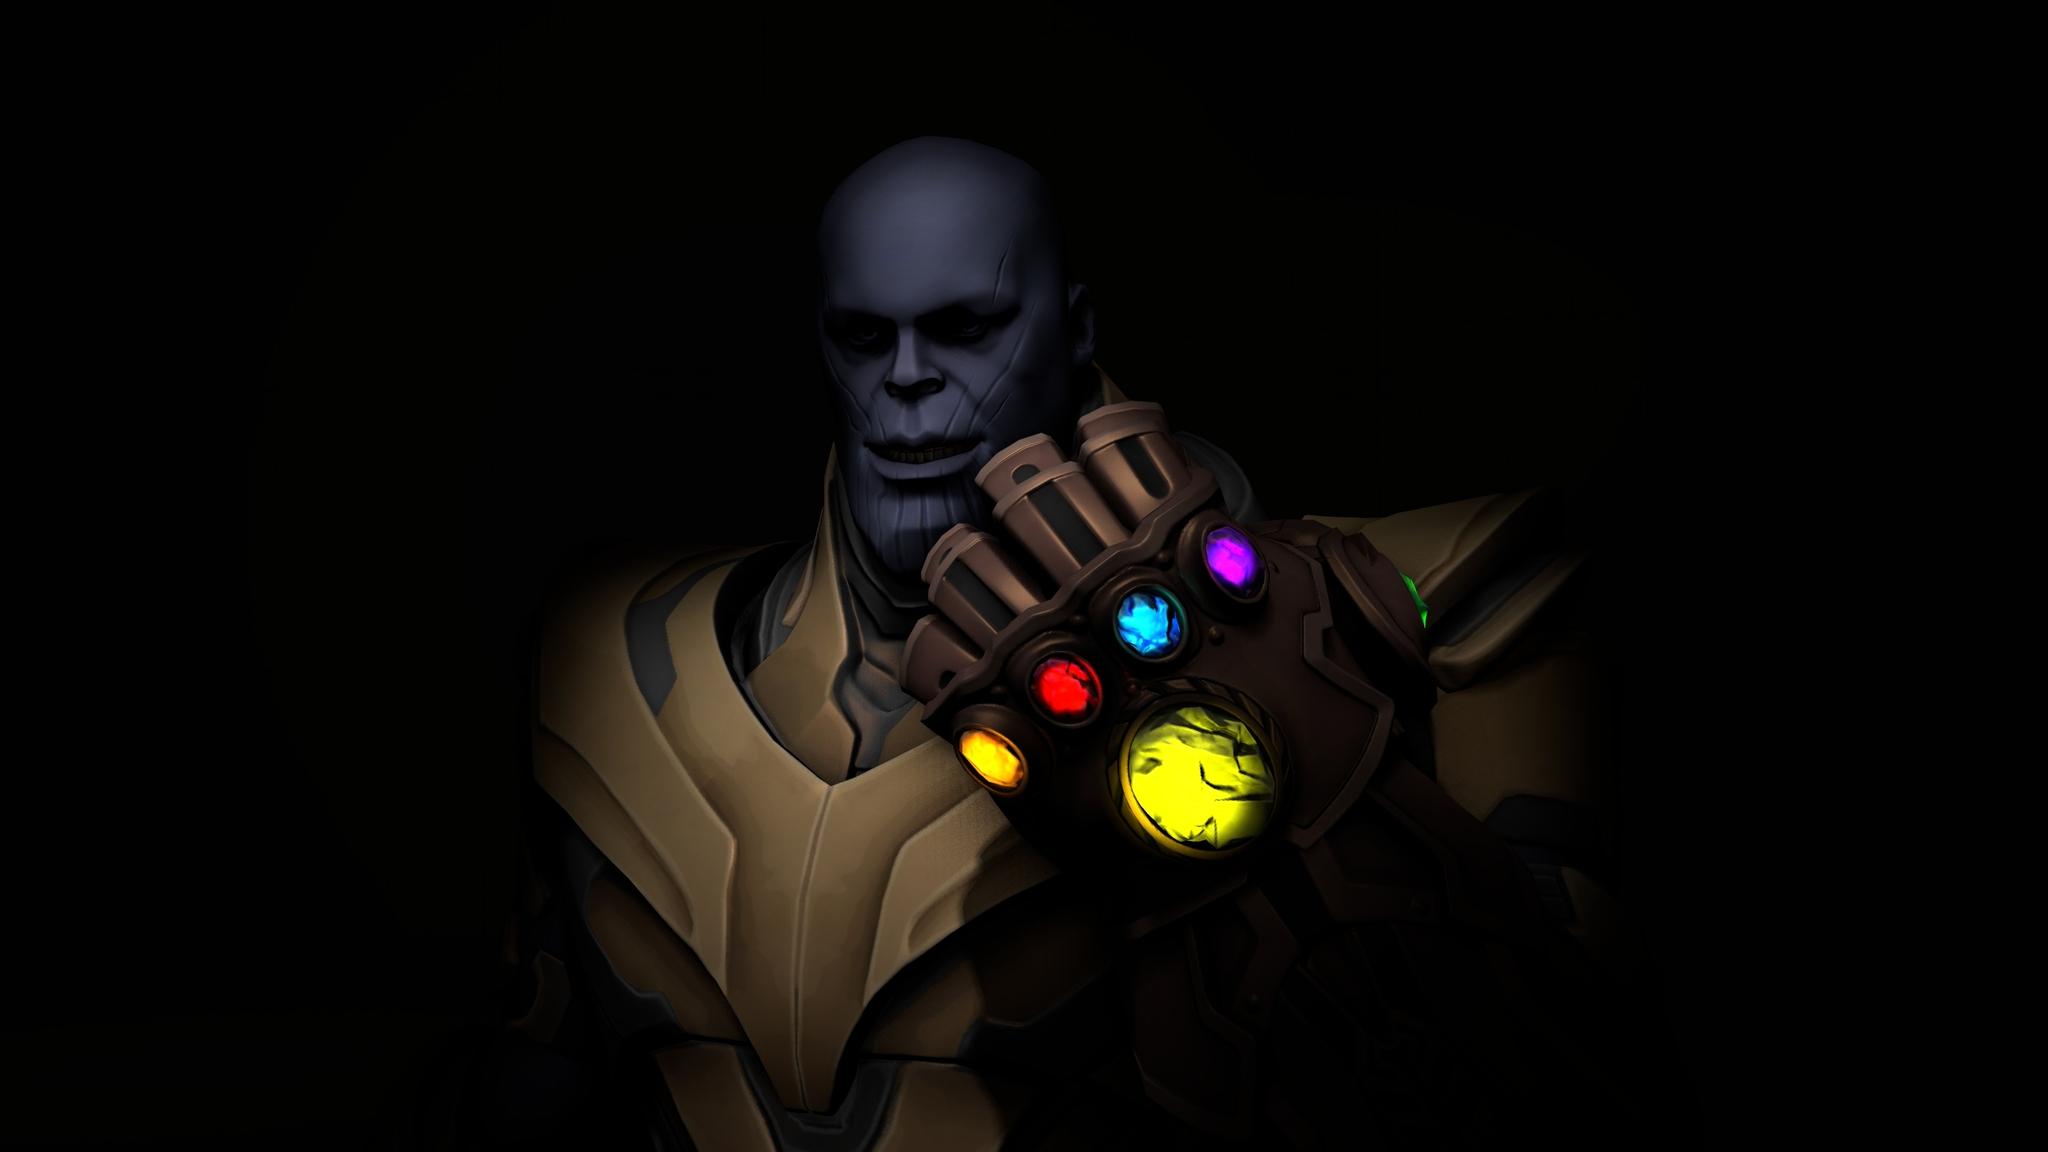 2048x1152 Thanos Fortnite 2048x1152 Resolution Hd 4k